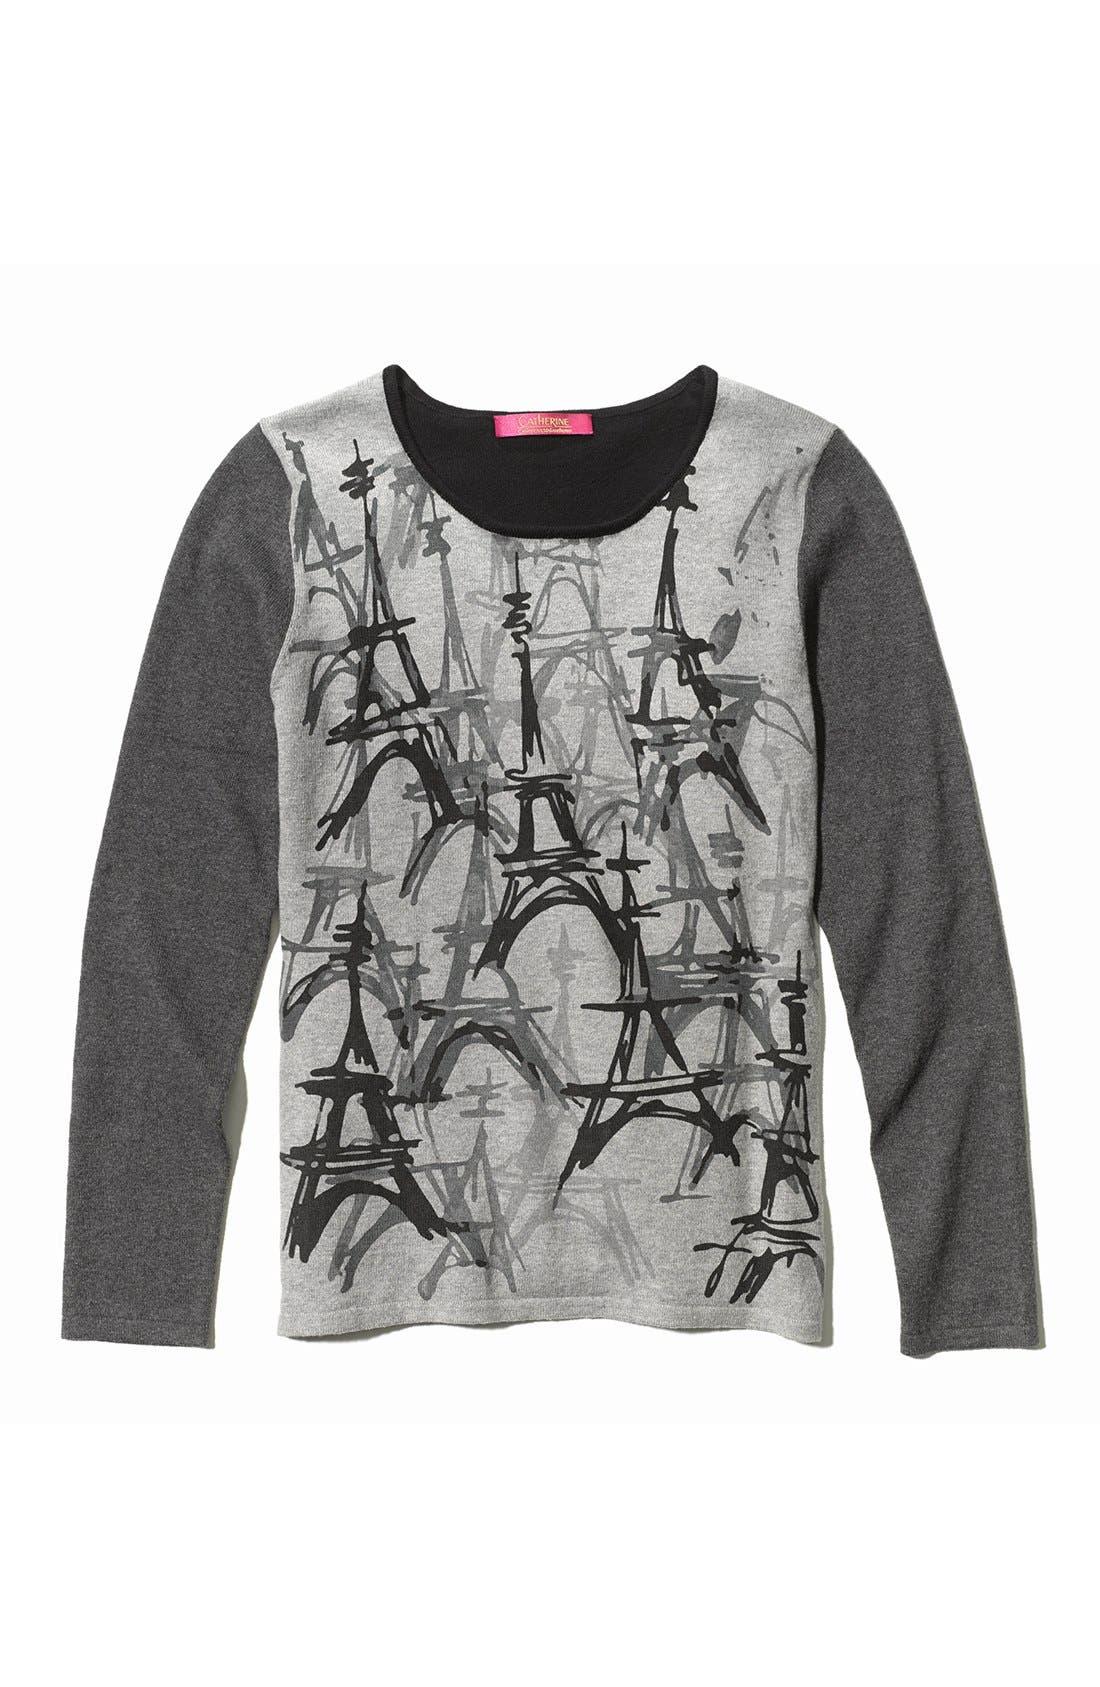 CATHERINE CATHERINE MALANDRINO,                             'Eiffel Tower' Sweater,                             Alternate thumbnail 3, color,                             445